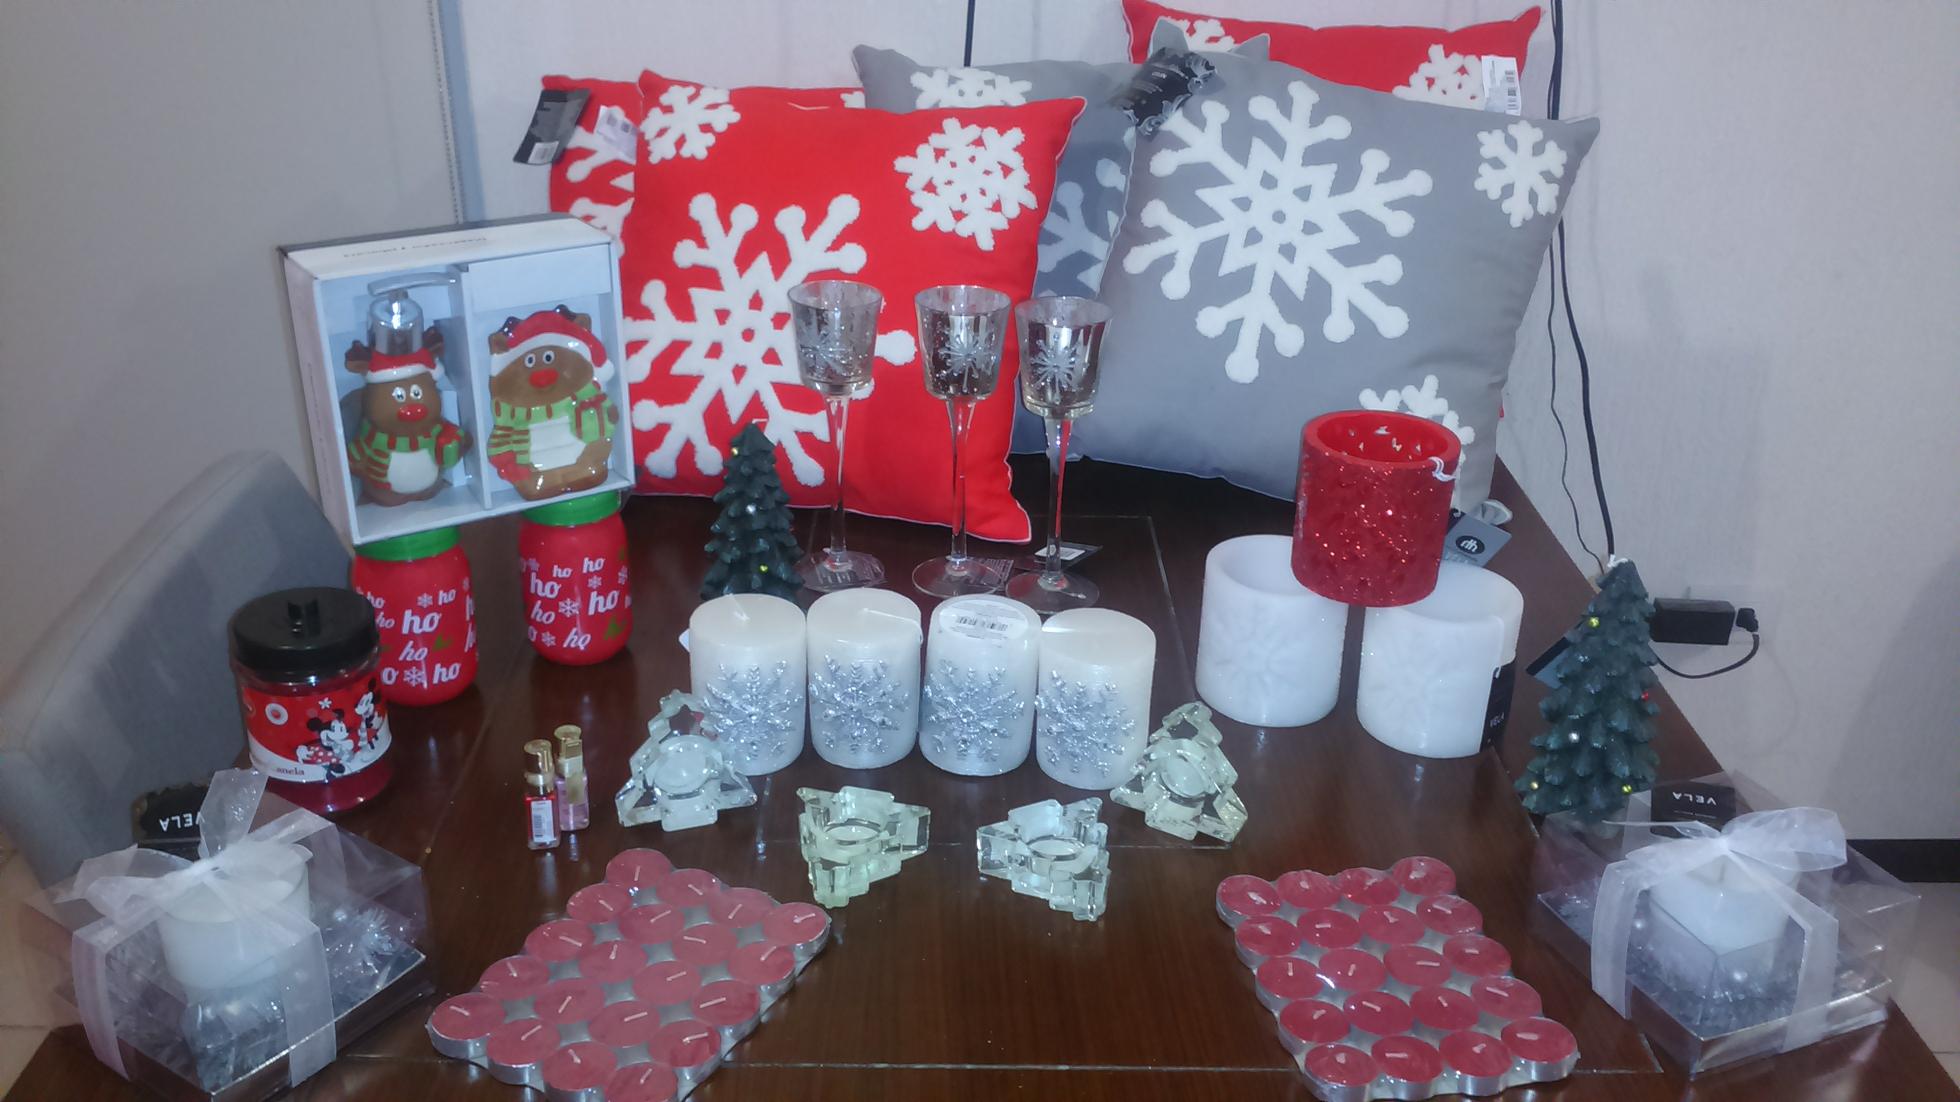 Walmart Sun Moll VIP NL: Artículos navideños varios desde $5.01